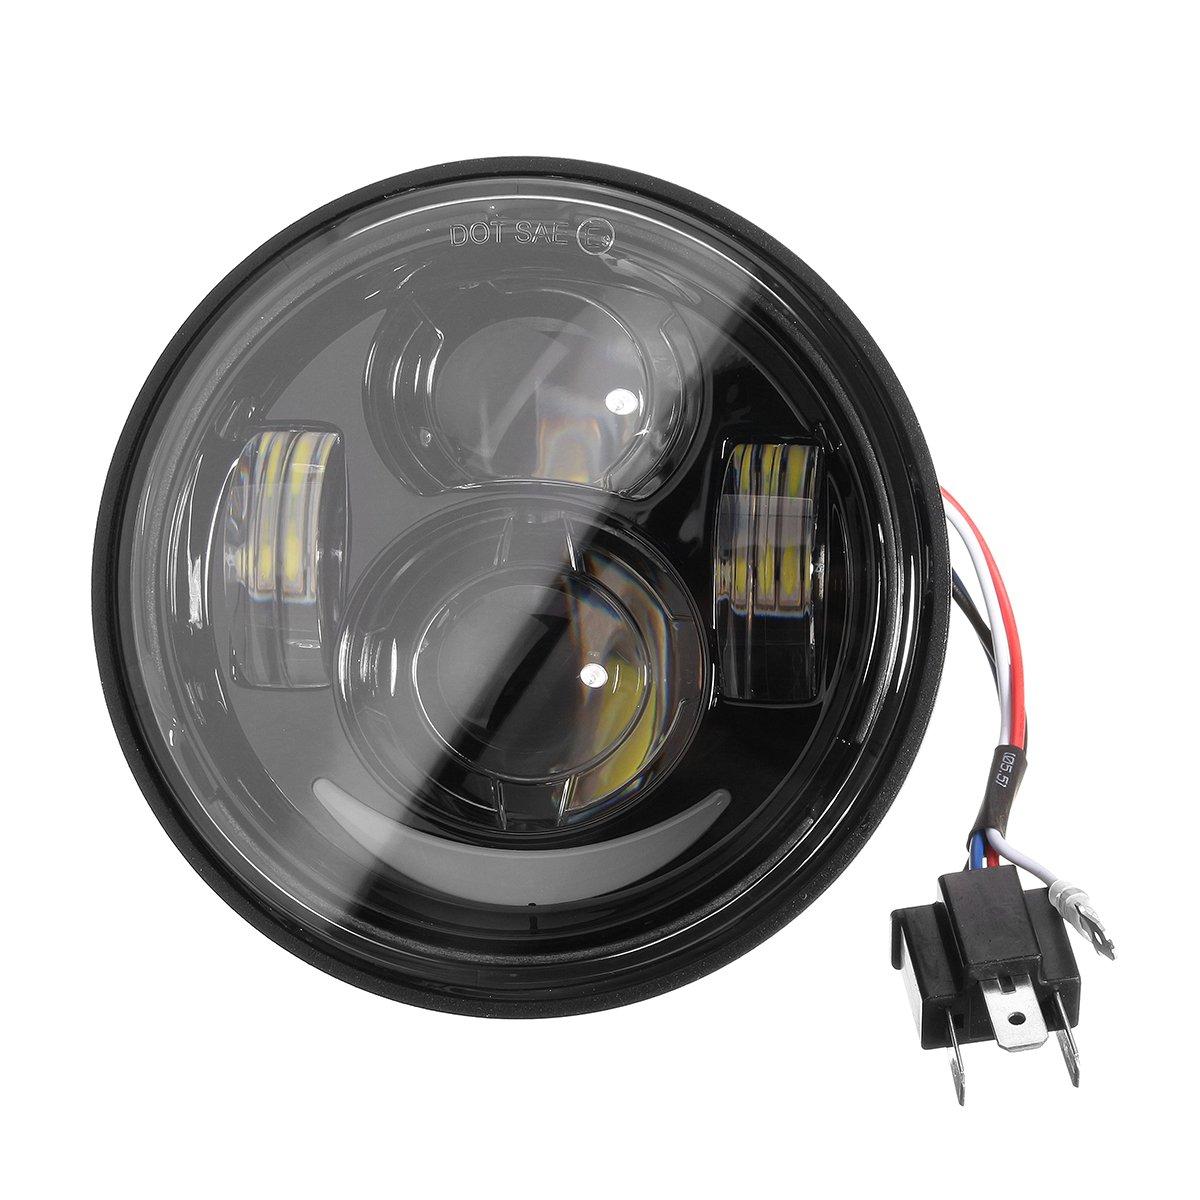 Amazon.com : Motorcycle Lights 4.65inch LED Daymaker HI/LO ... on